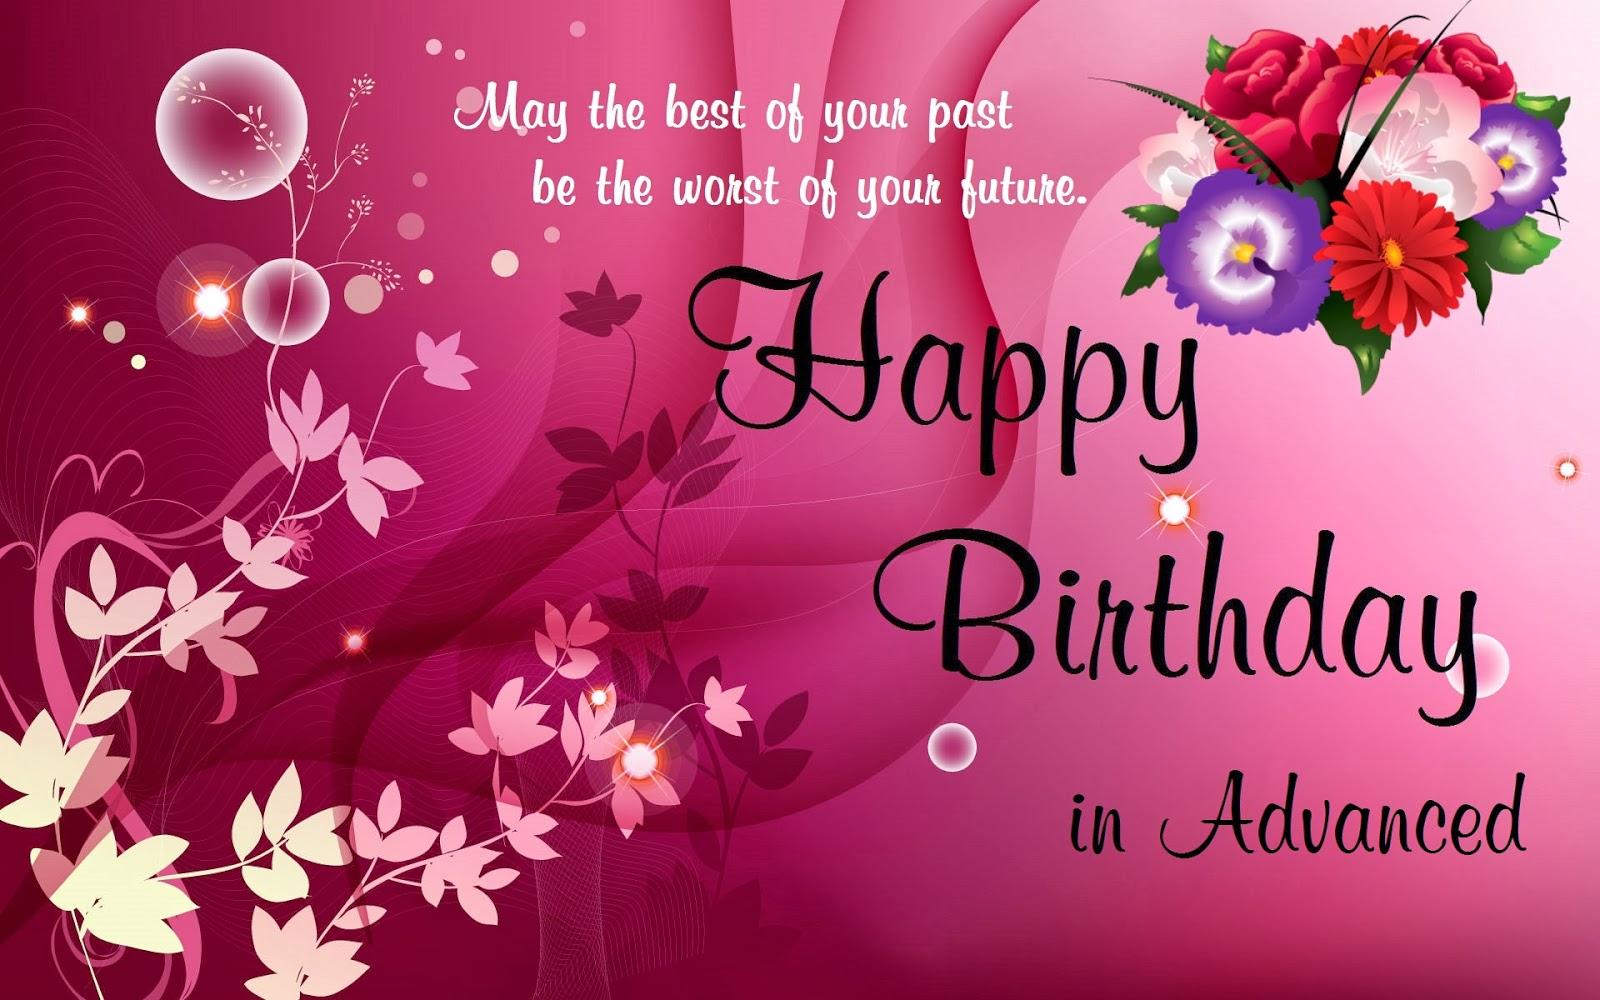 happy birthday wishes in advance